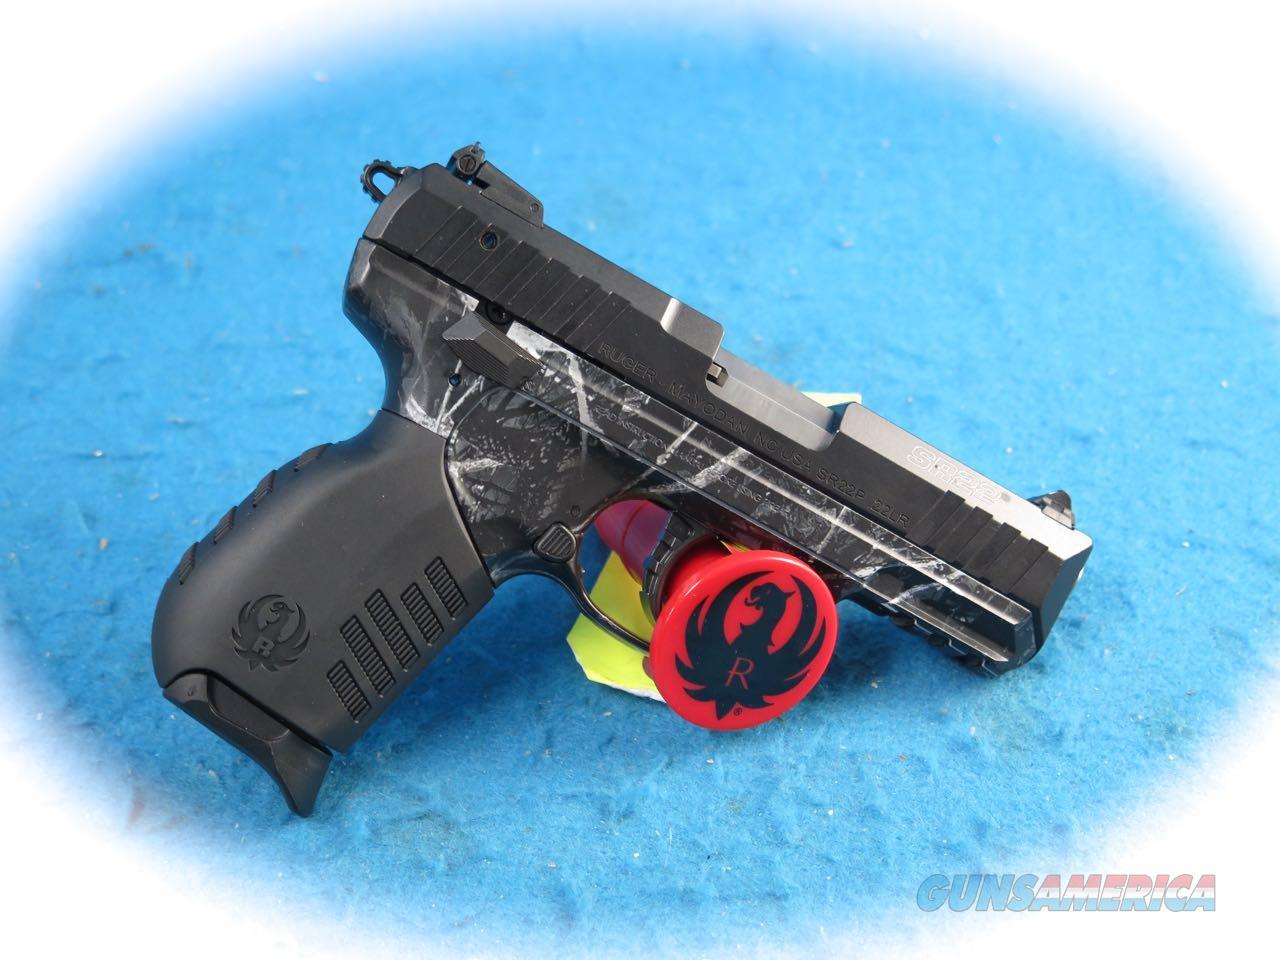 Ruger SR22 Semi Auto .22LR Pistol Model 3637m**New**  Guns > Pistols > Ruger Semi-Auto Pistols > SR Family > SR22